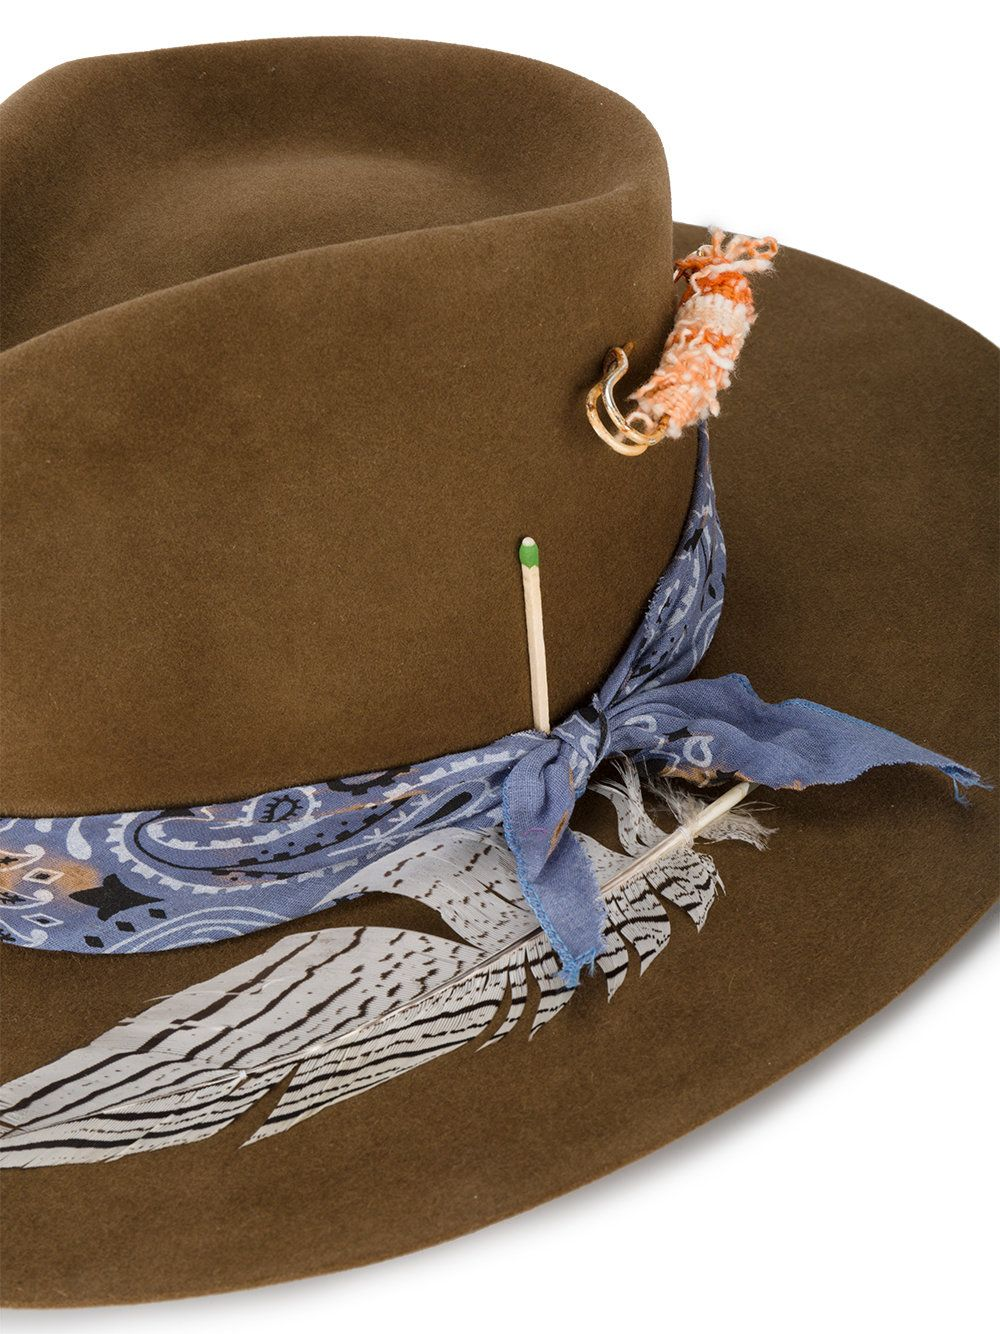 7c80cd52 Nick Fouquet Bandito feather trim hat | hats | Hats, Fedora hat ...